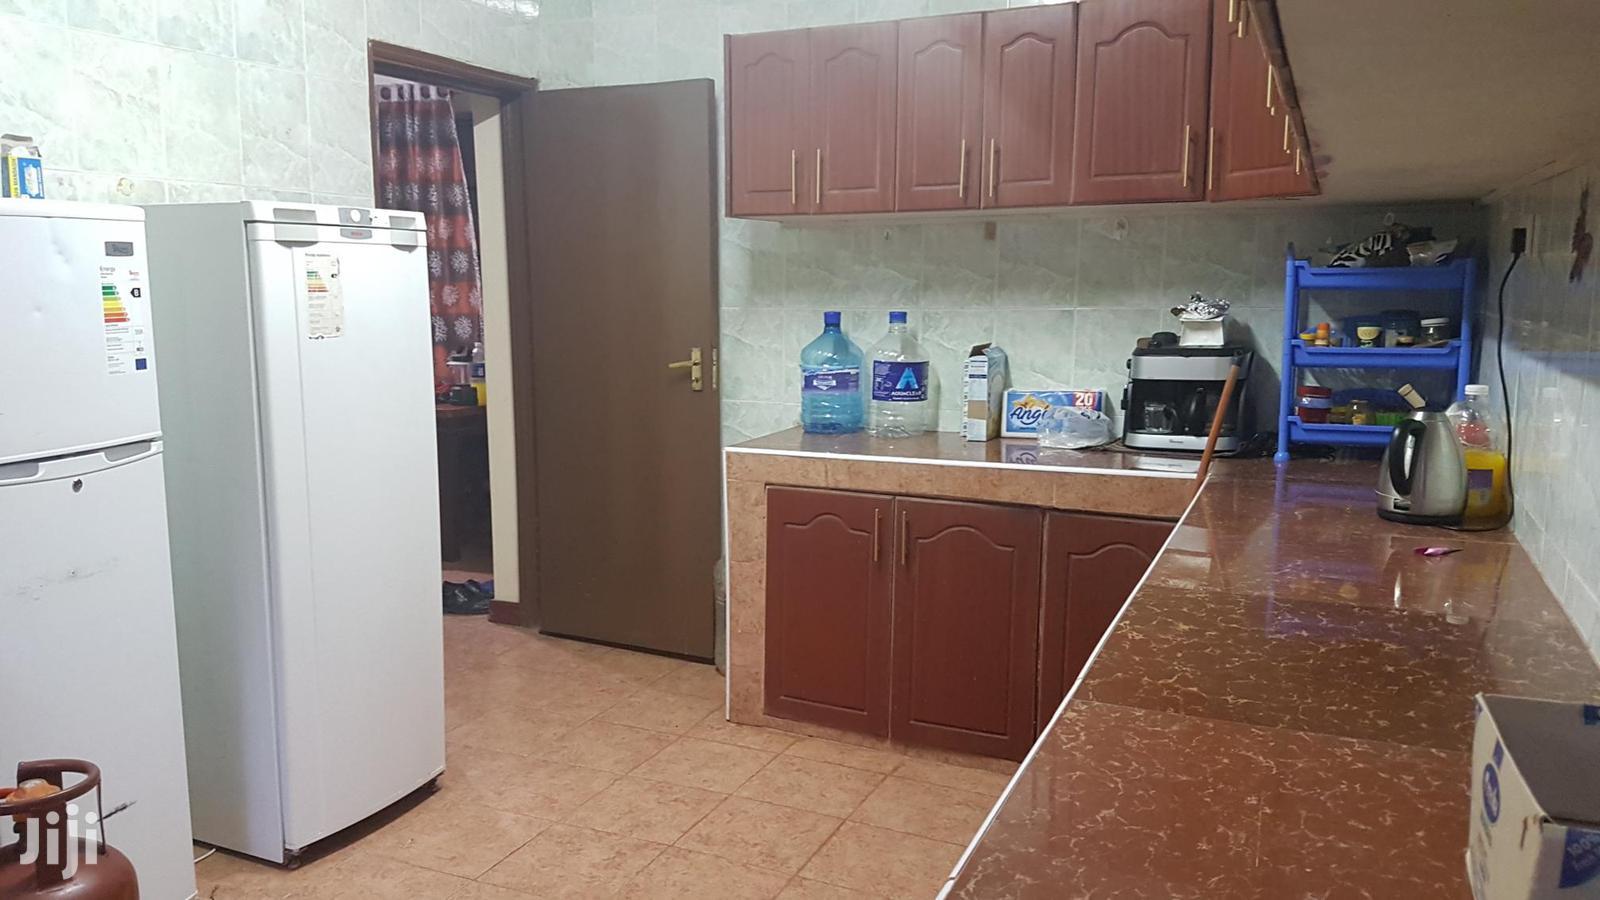 3 Bedroom Apartment In Kilimani   Houses & Apartments For Rent for sale in Karen, Nairobi, Kenya